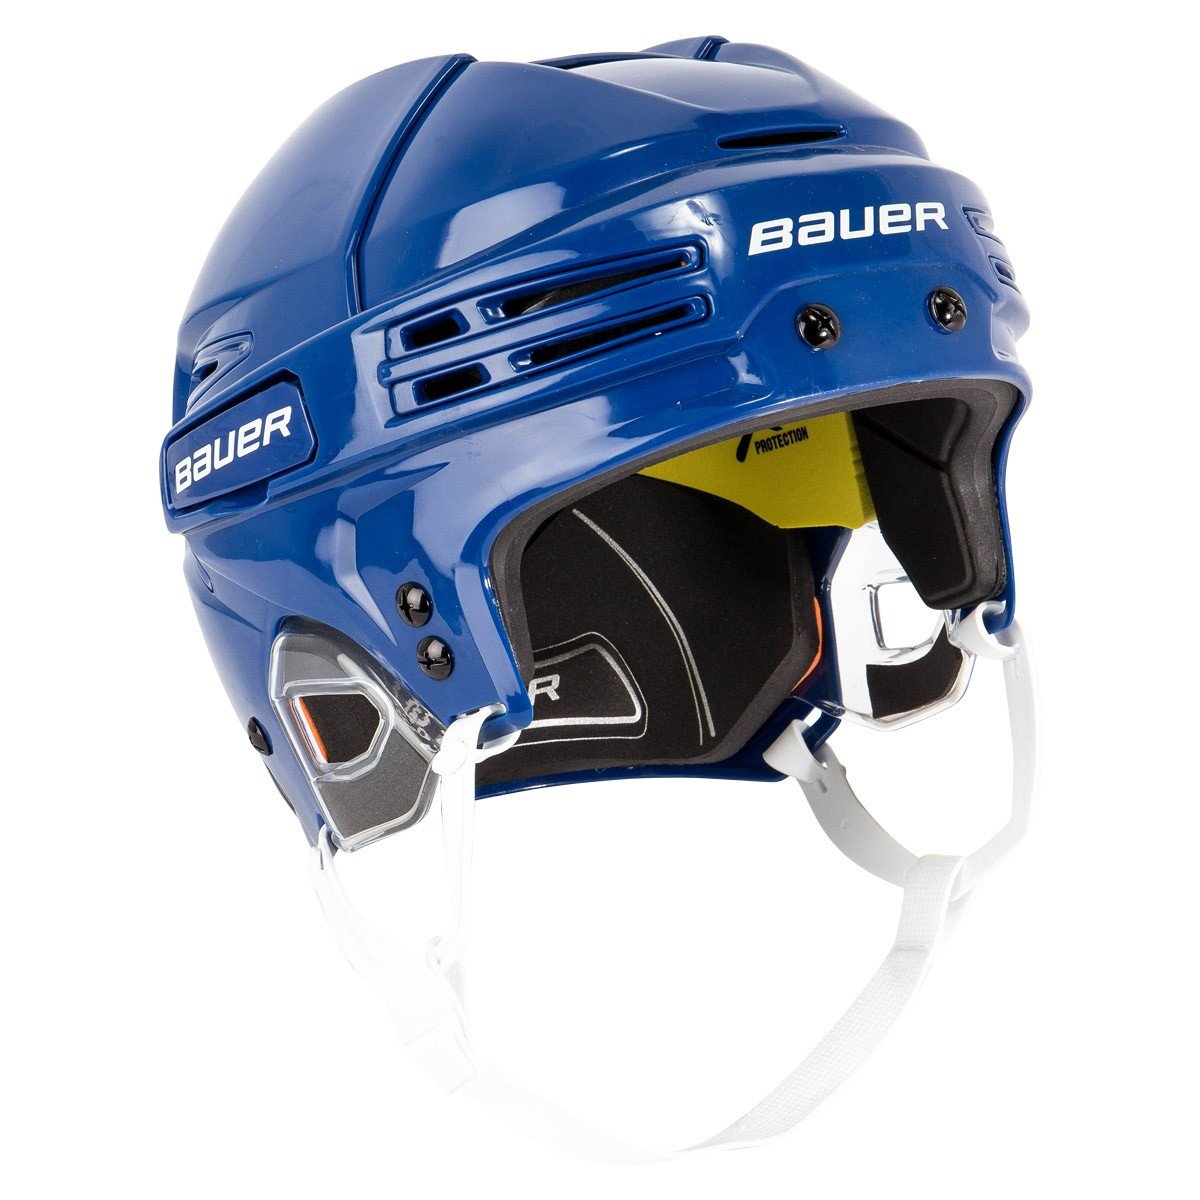 Bauer React 75 Helmet, Taille:S, Couleur:Blue Unknown